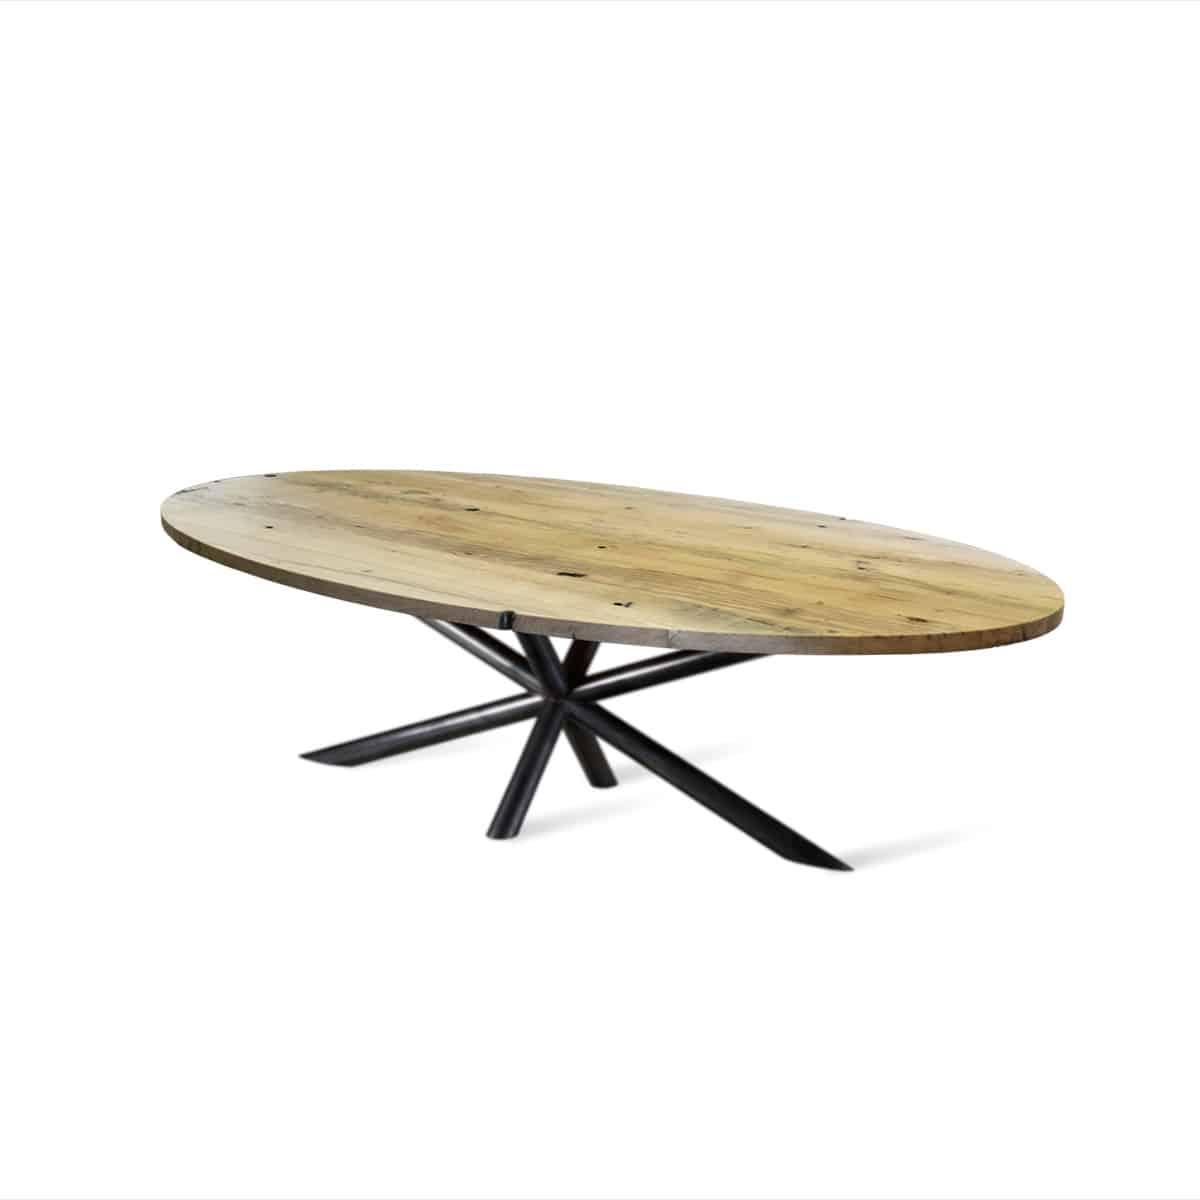 Ovaal ovale massief eiken boomstam eetkamer tafel eettafel keuken meubelmaker Friesland